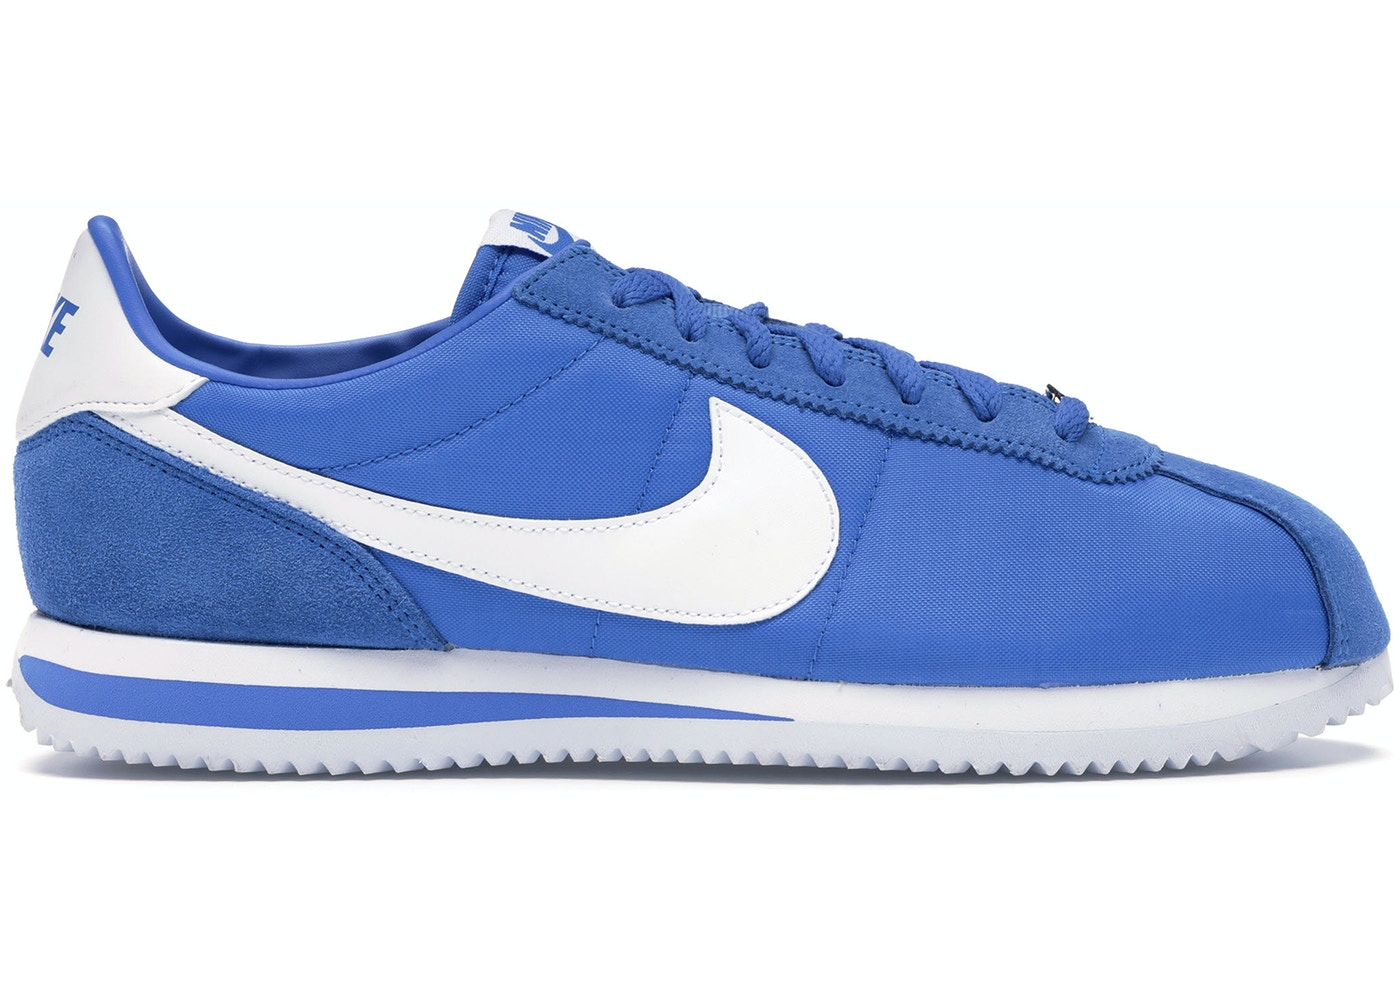 Melodramático desempleo encima  Nike Classic Cortez Nylon Signal Blue - 819720-402